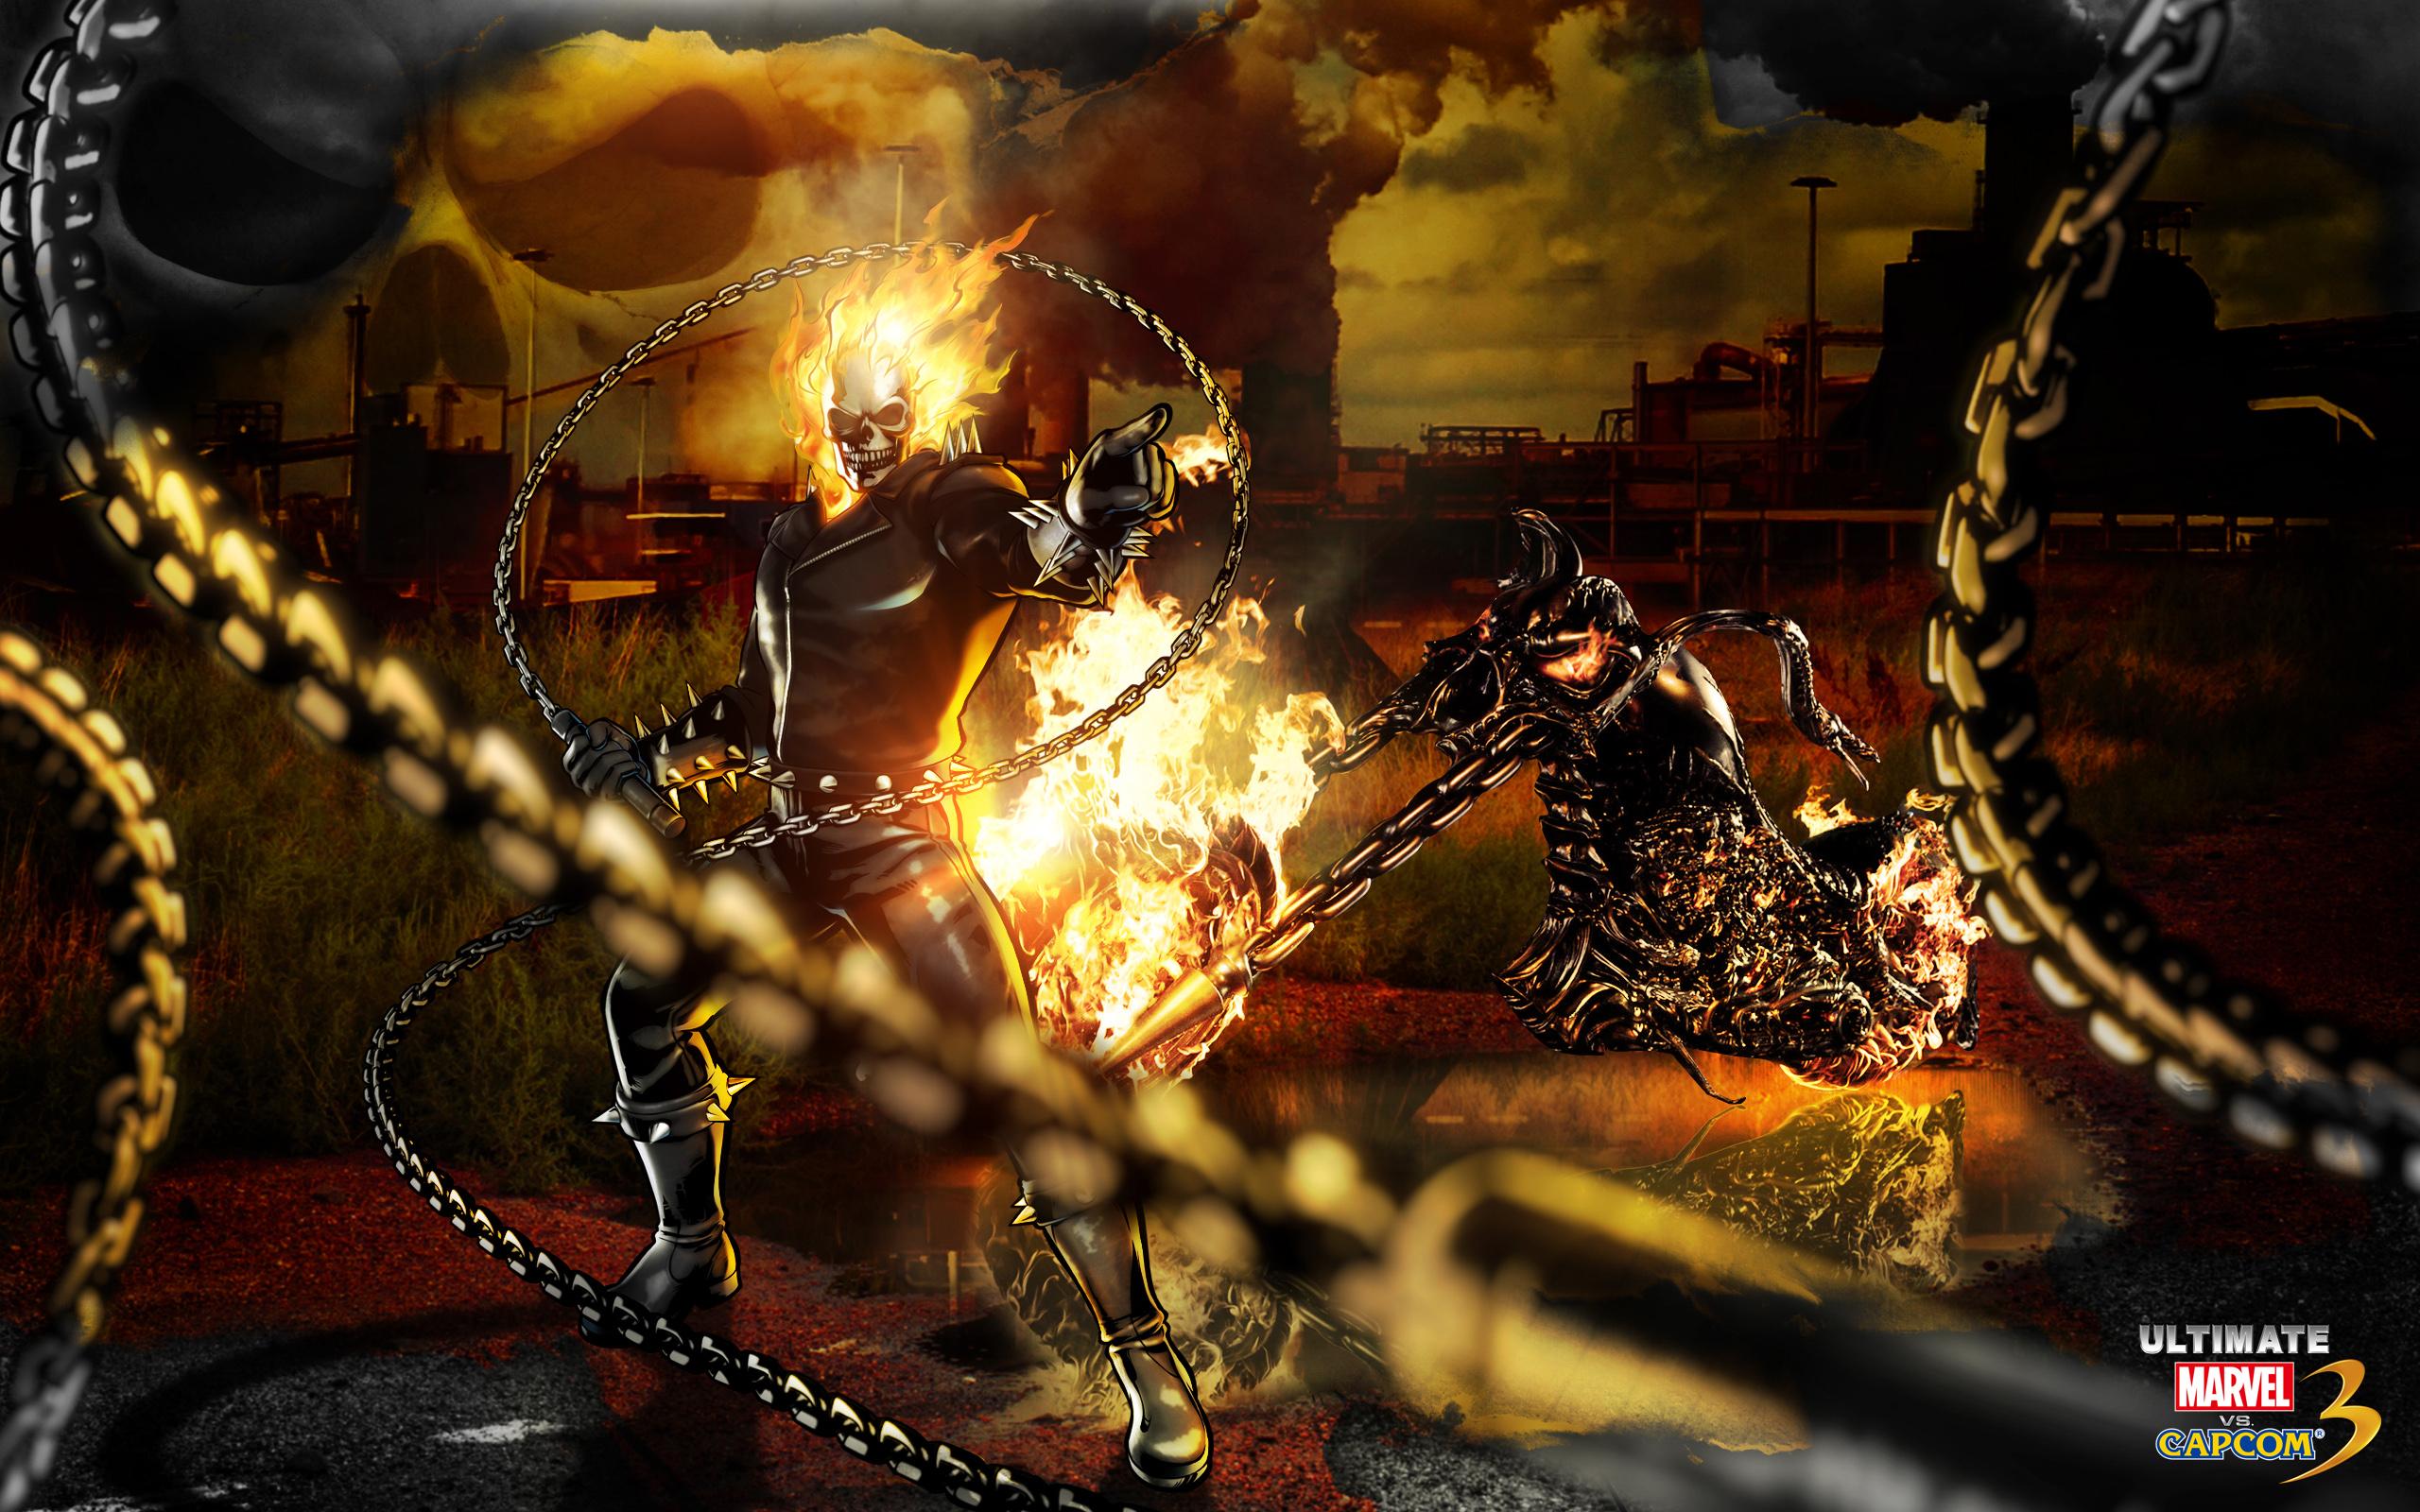 Ghost Rider Marvel Vs Capcom Wallpapers HD Wallpapers 2560x1600